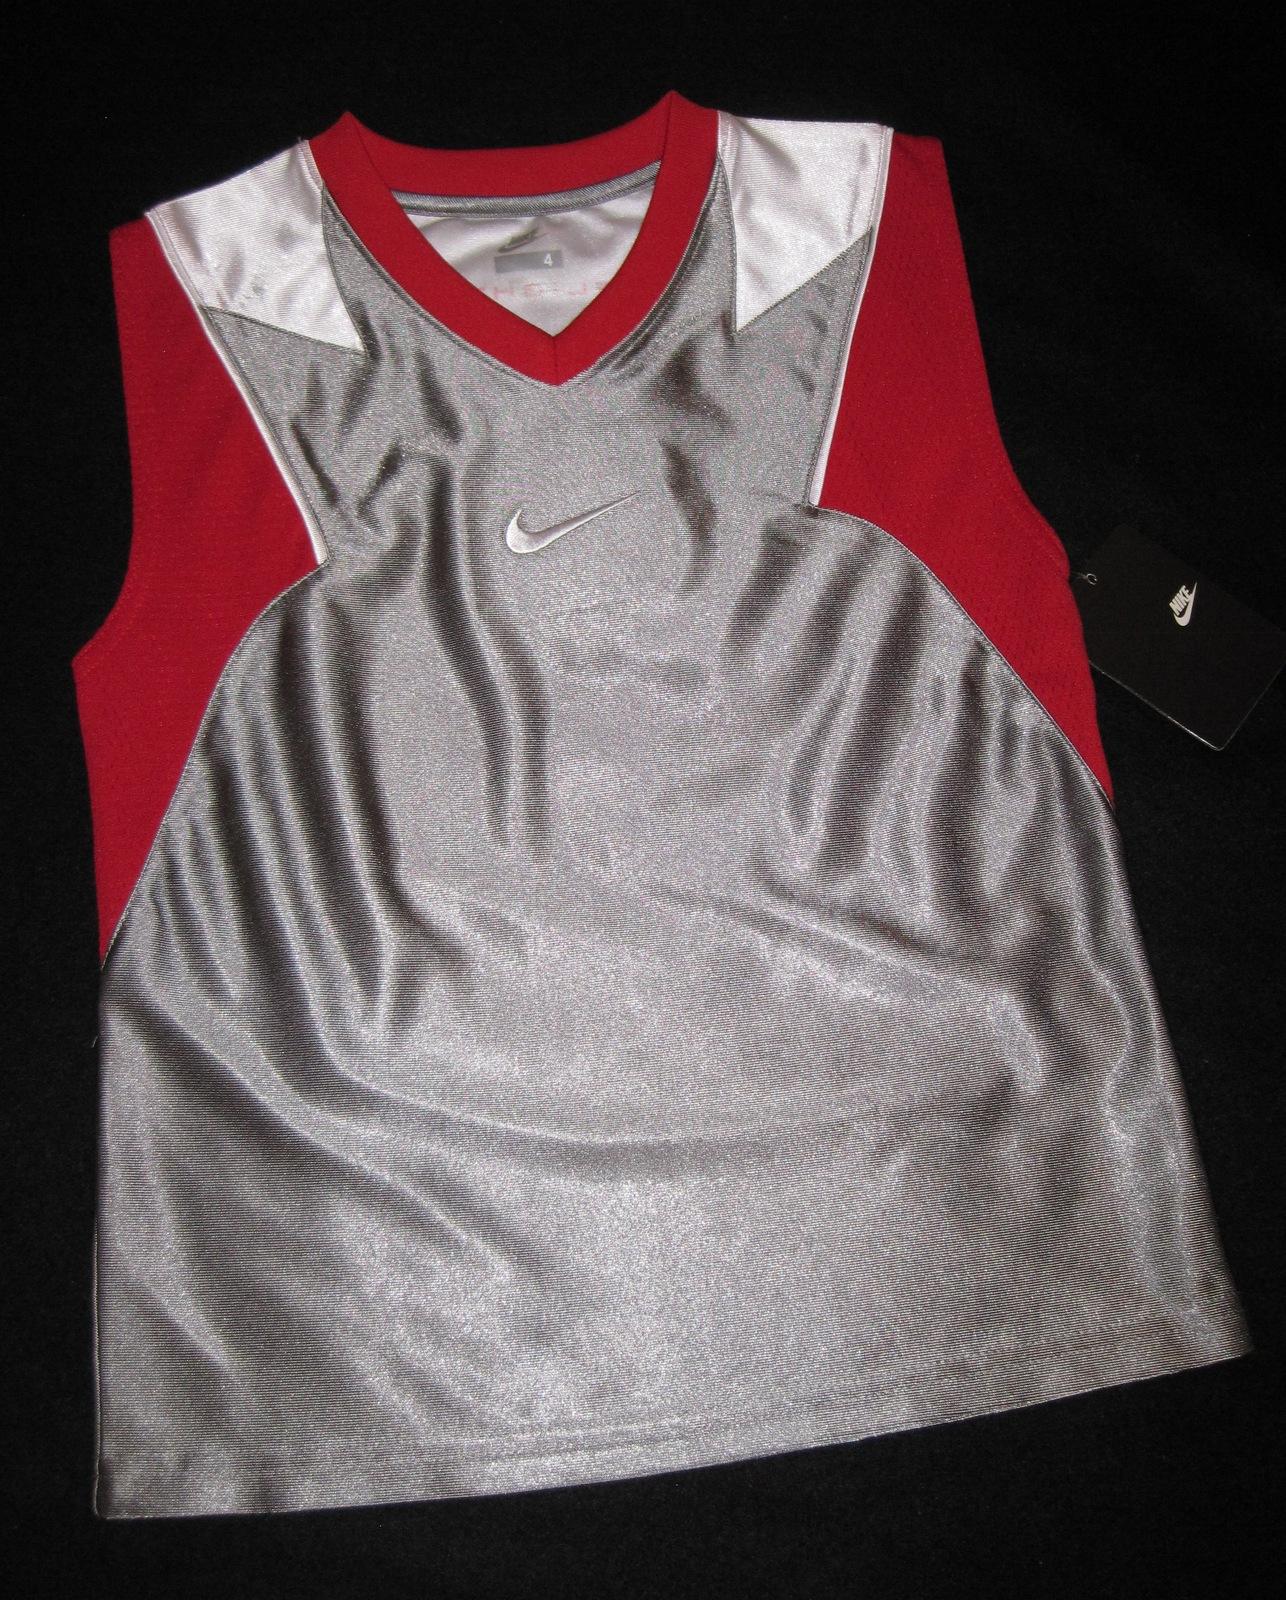 BOYS 6 - Nike - Flight Grey-Red-White BASKETBALL SPORTS JERSEY image 10